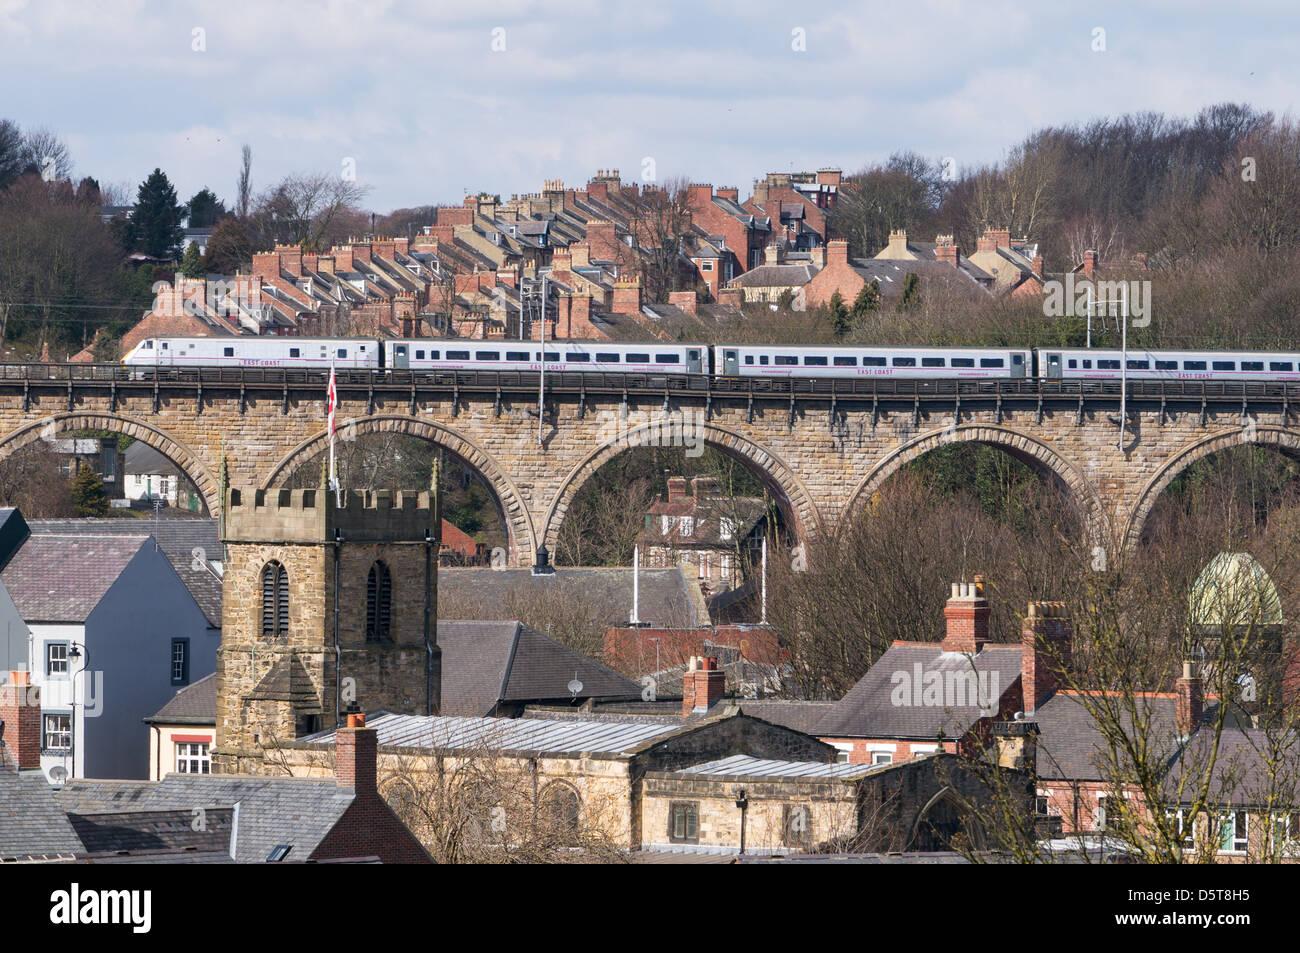 East coast express passenger train crosses Durham railway viaduct north east England UK - Stock Image